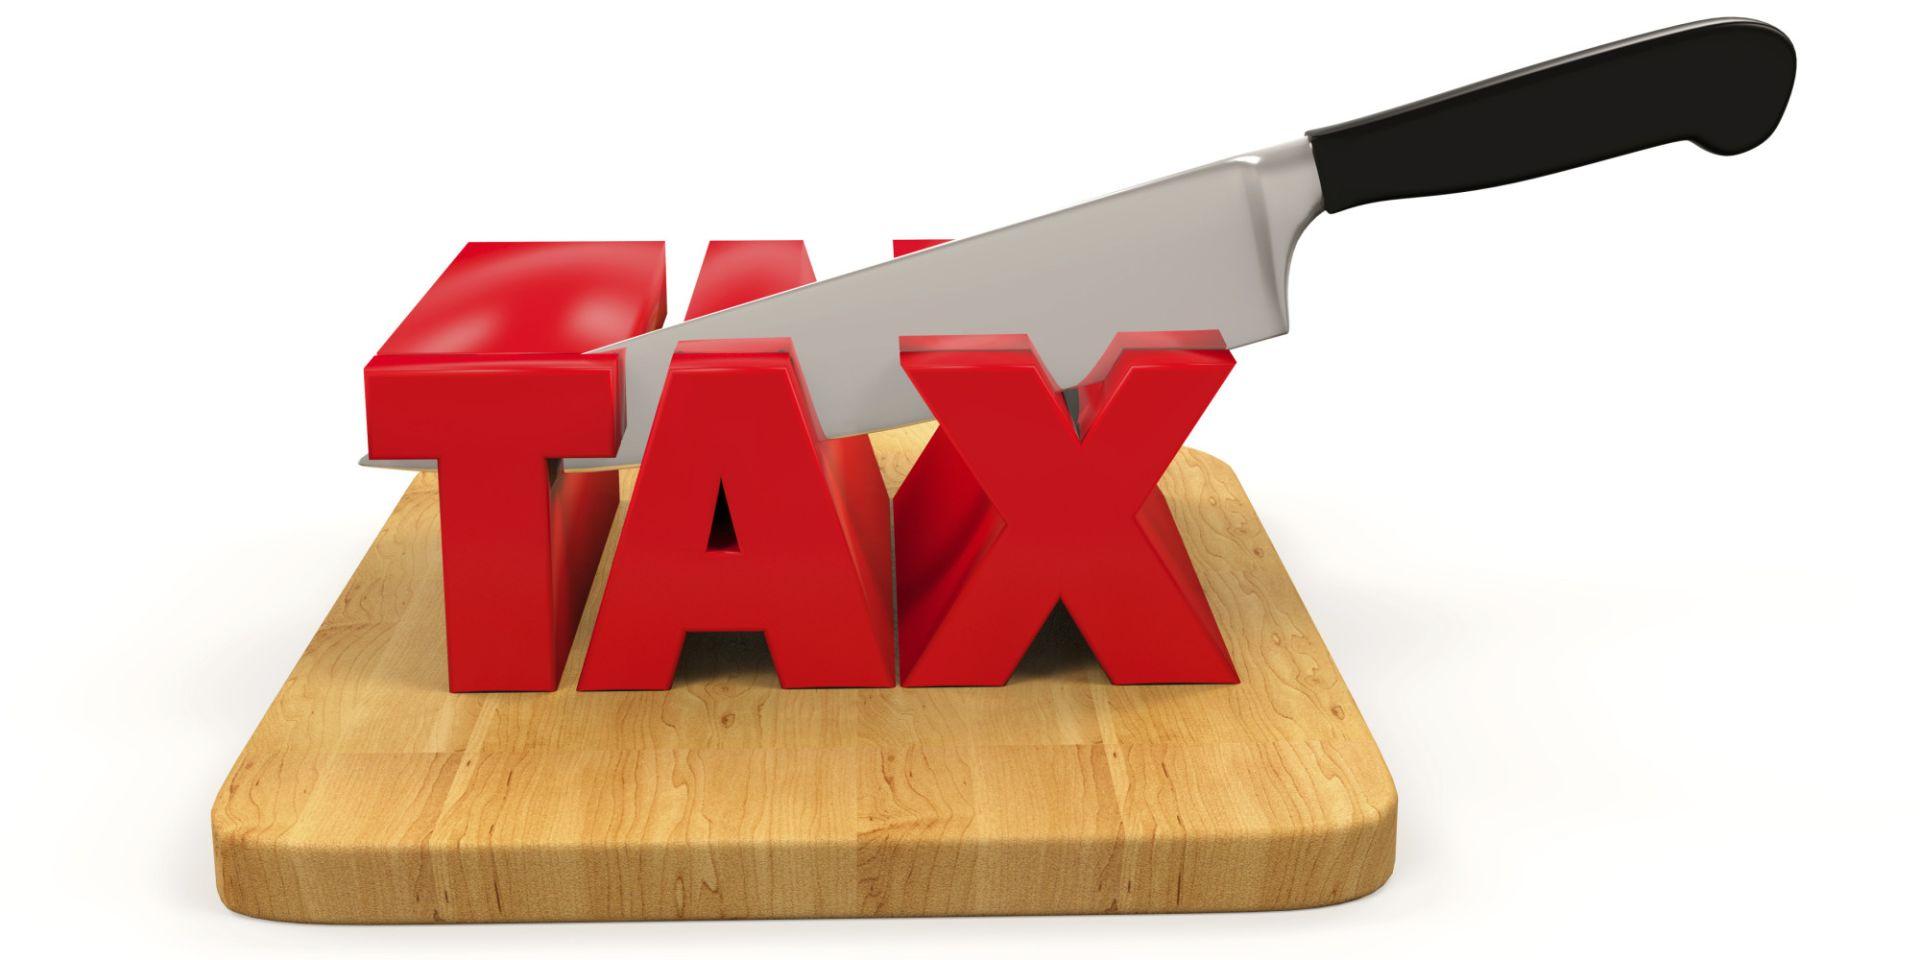 Fla. Legislature: Business rent tax cut advances